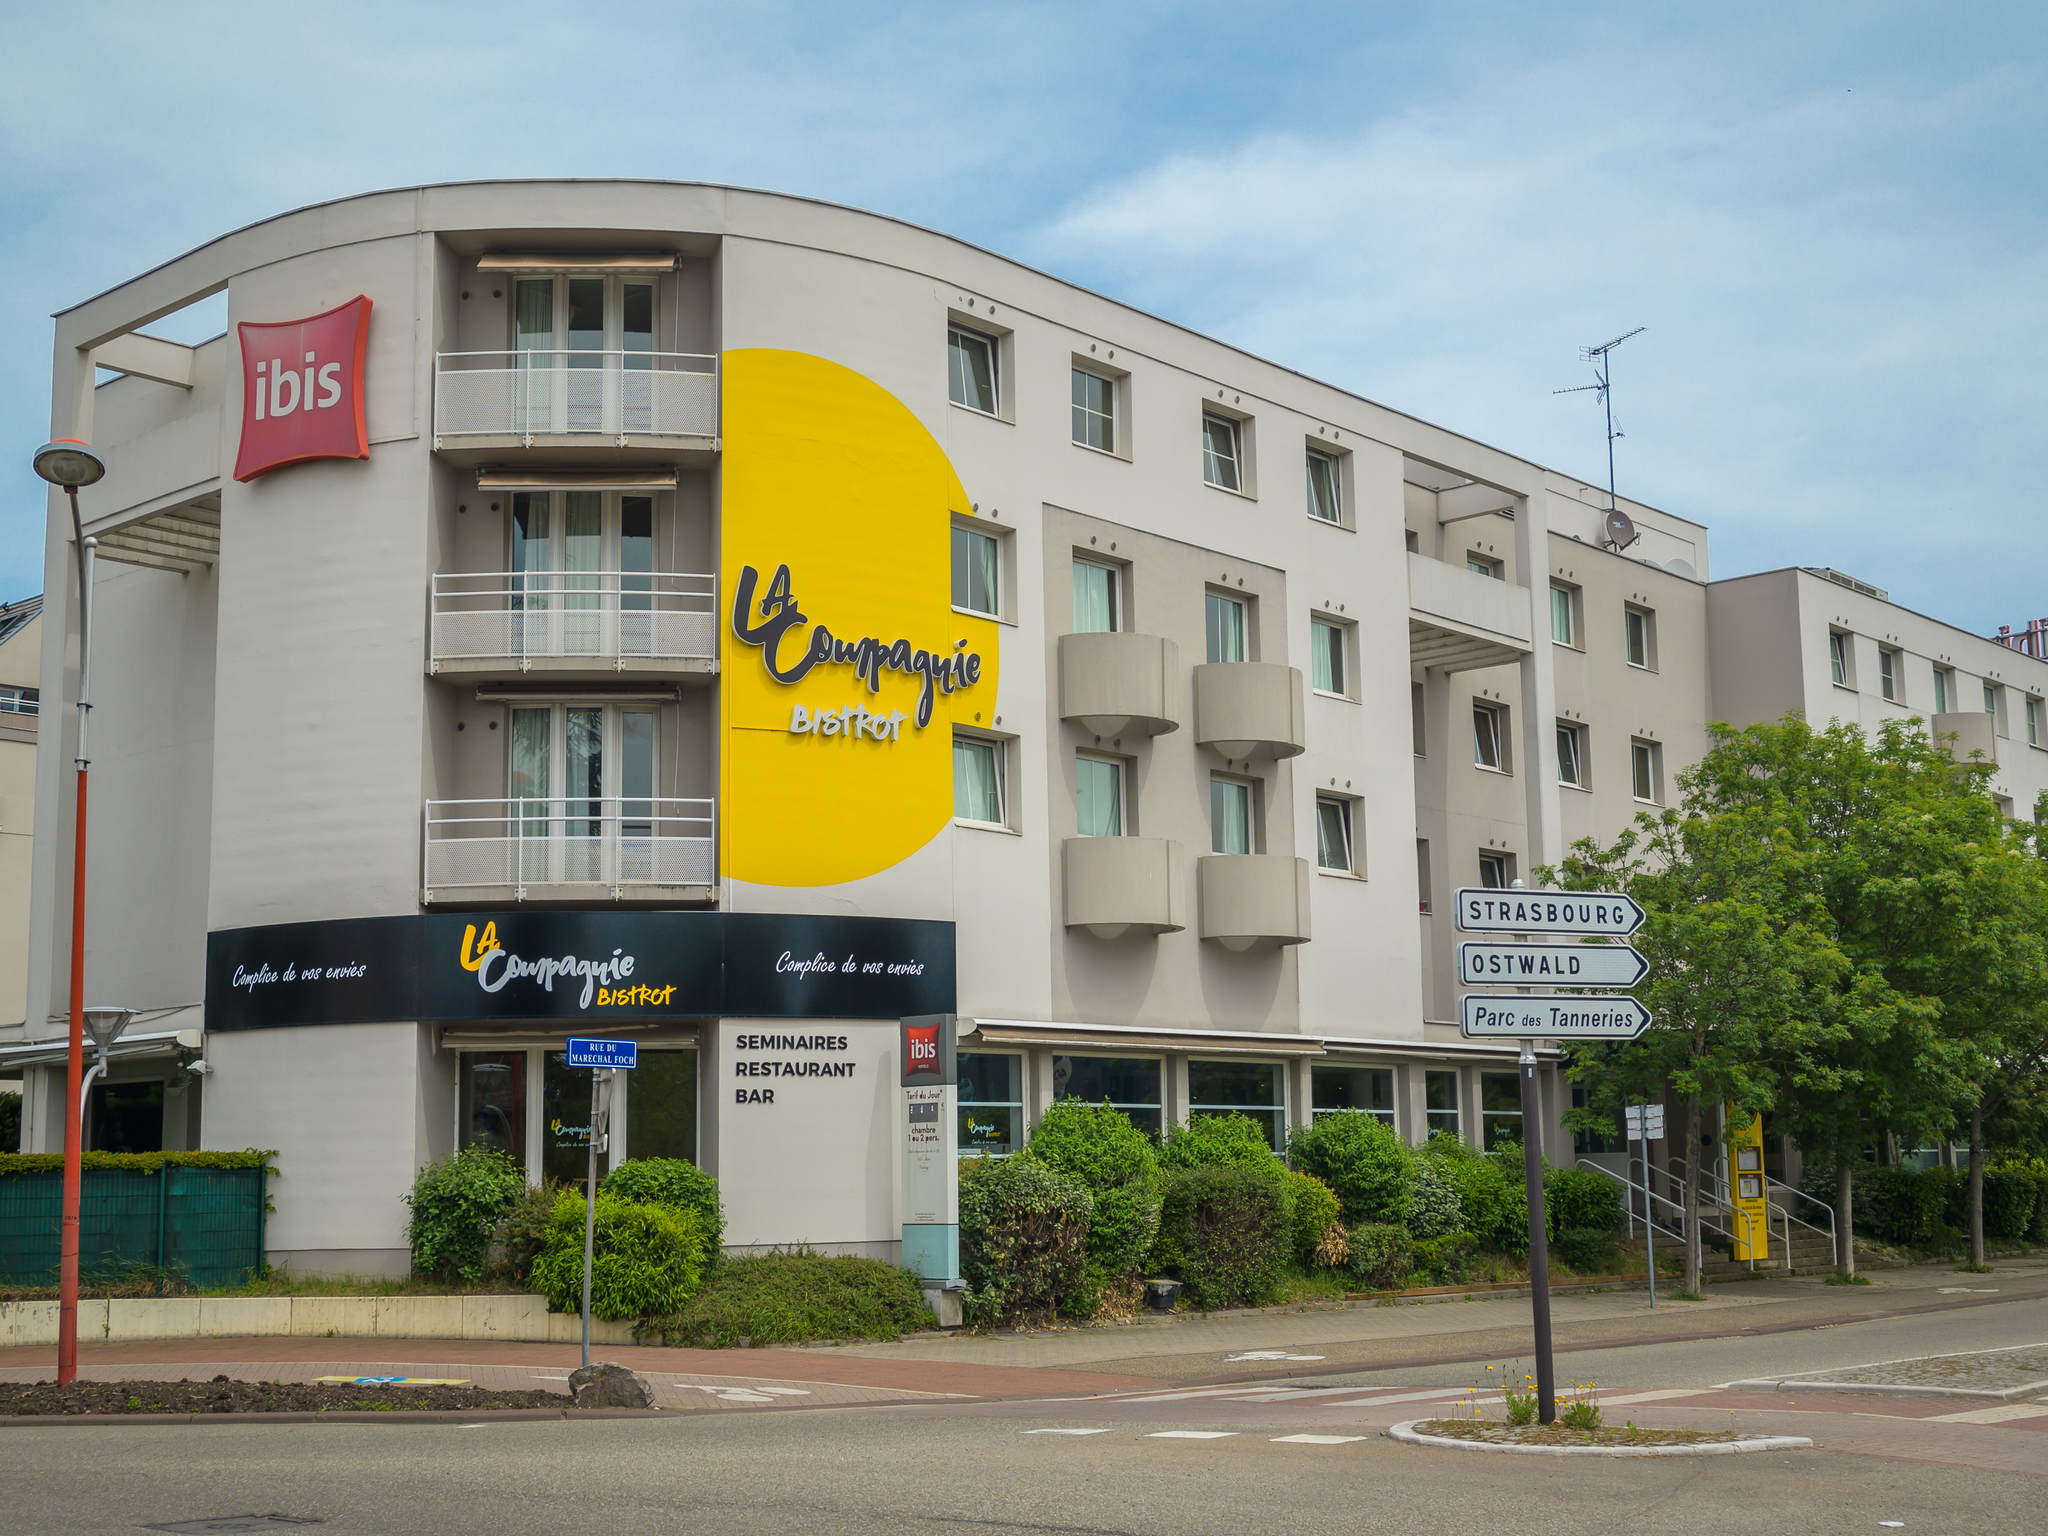 appart hotel strasbourg pas cher finest strasbourg with appart hotel strasbourg pas cher. Black Bedroom Furniture Sets. Home Design Ideas